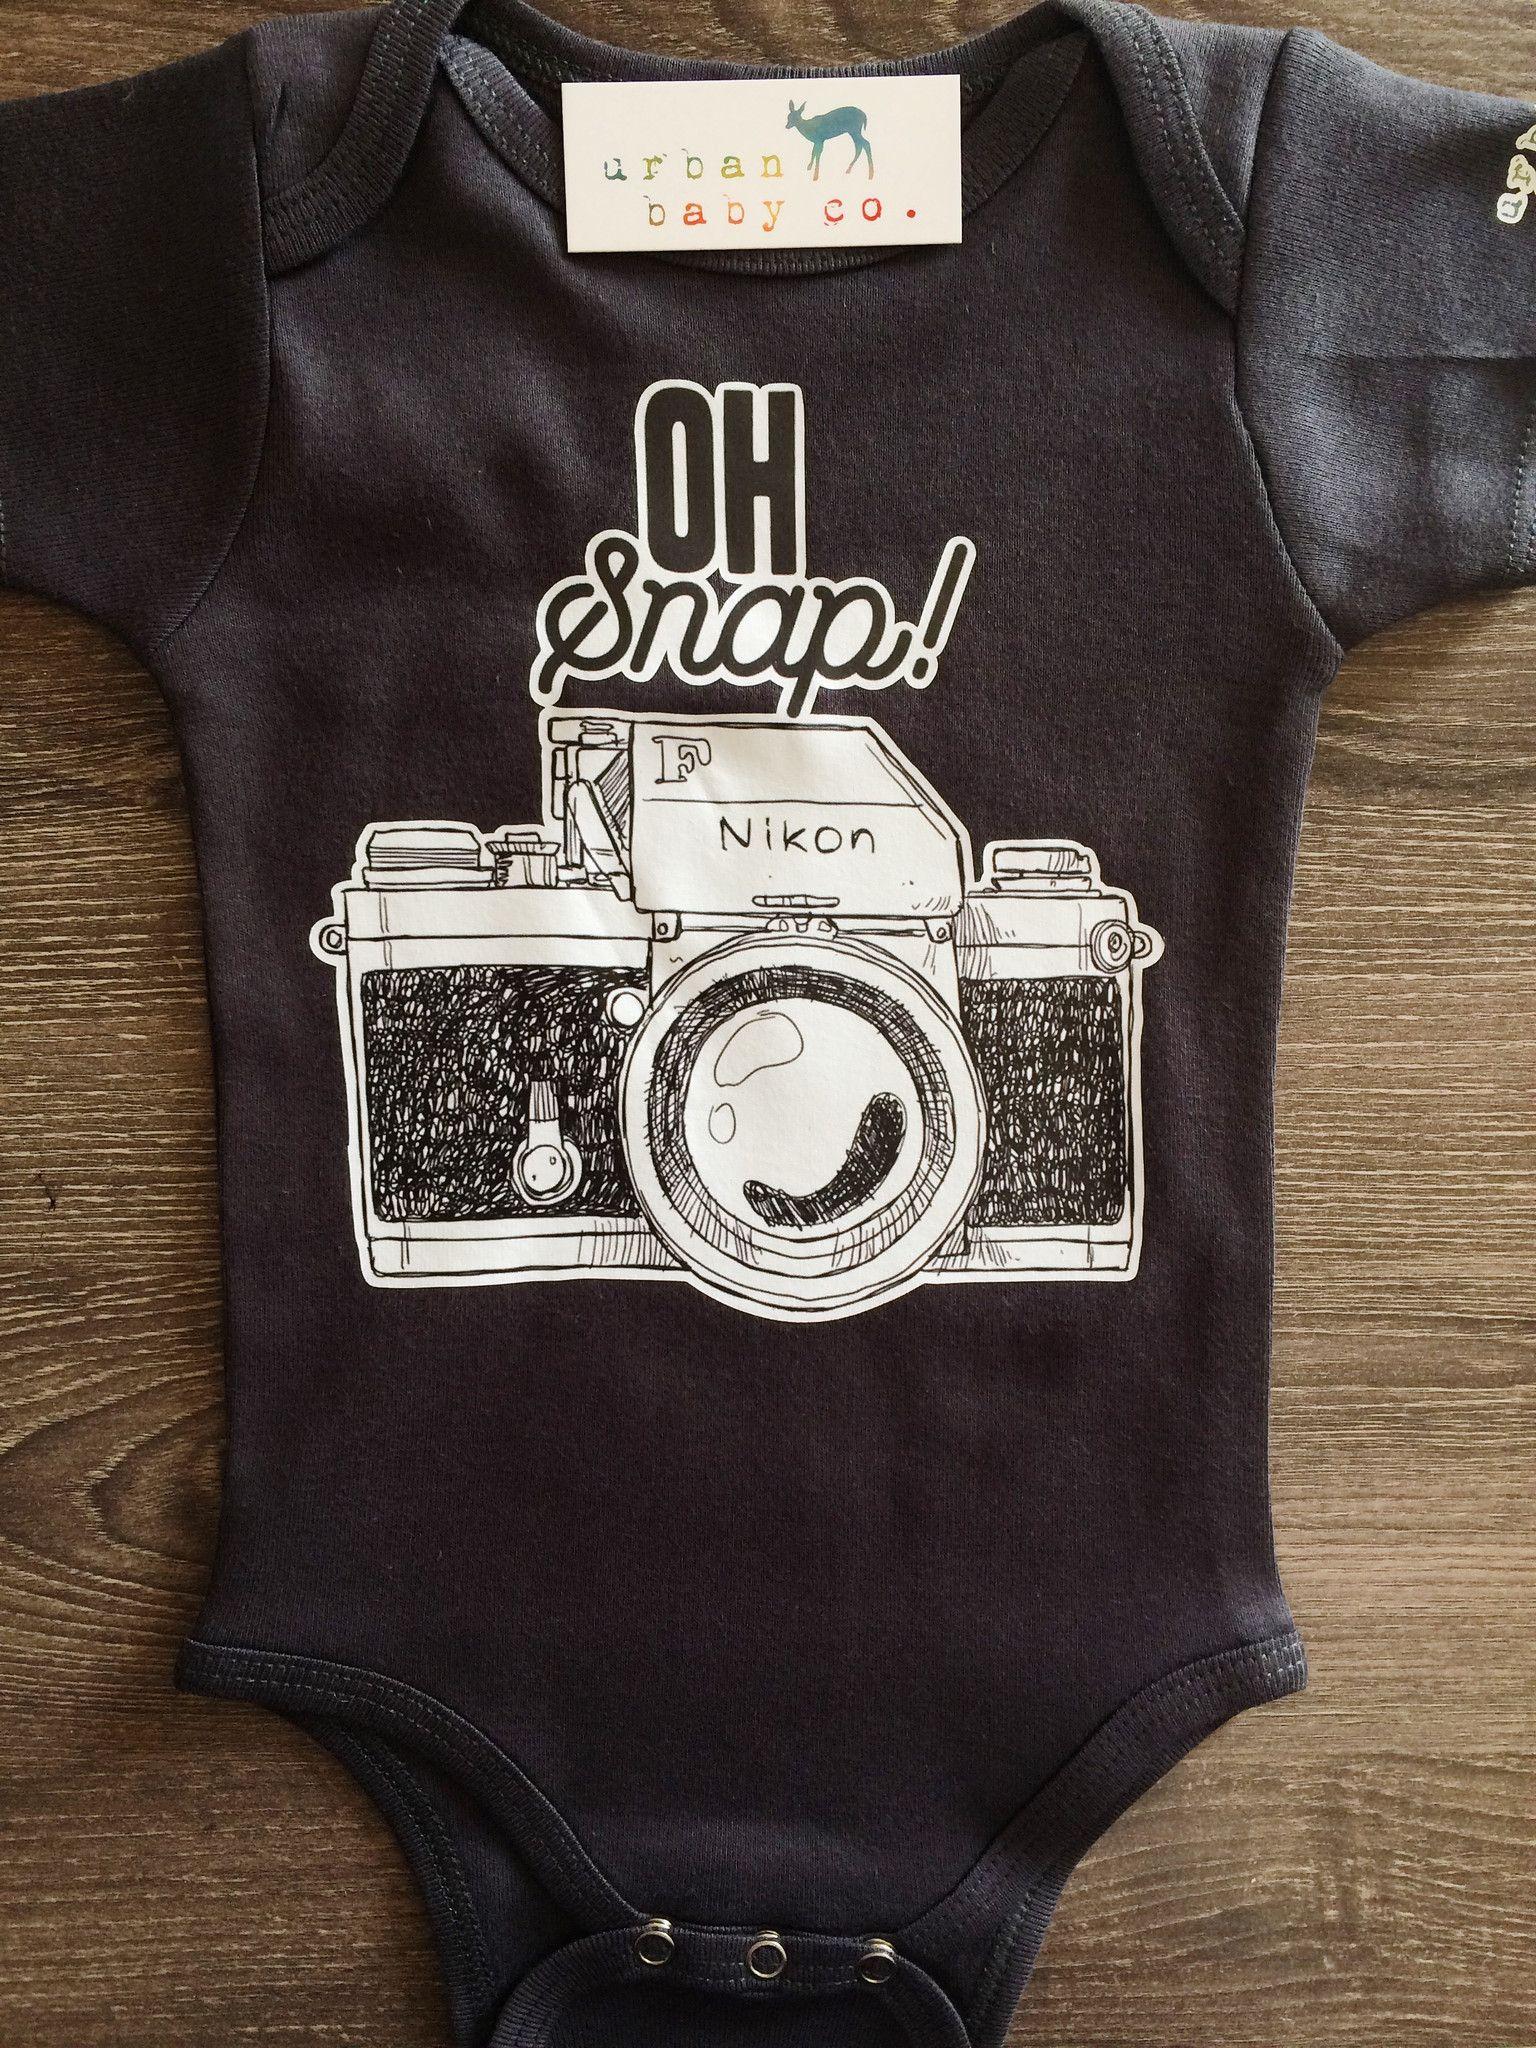 81b02cdd6 ... Nikon Camera, Photographer, Photography Baby, Boy, Girl, Unisex, Gender  Neutral, Infant, Toddler, Newborn, Organic, Bodysuit, Outfit, One Piece,  Onesie® ...